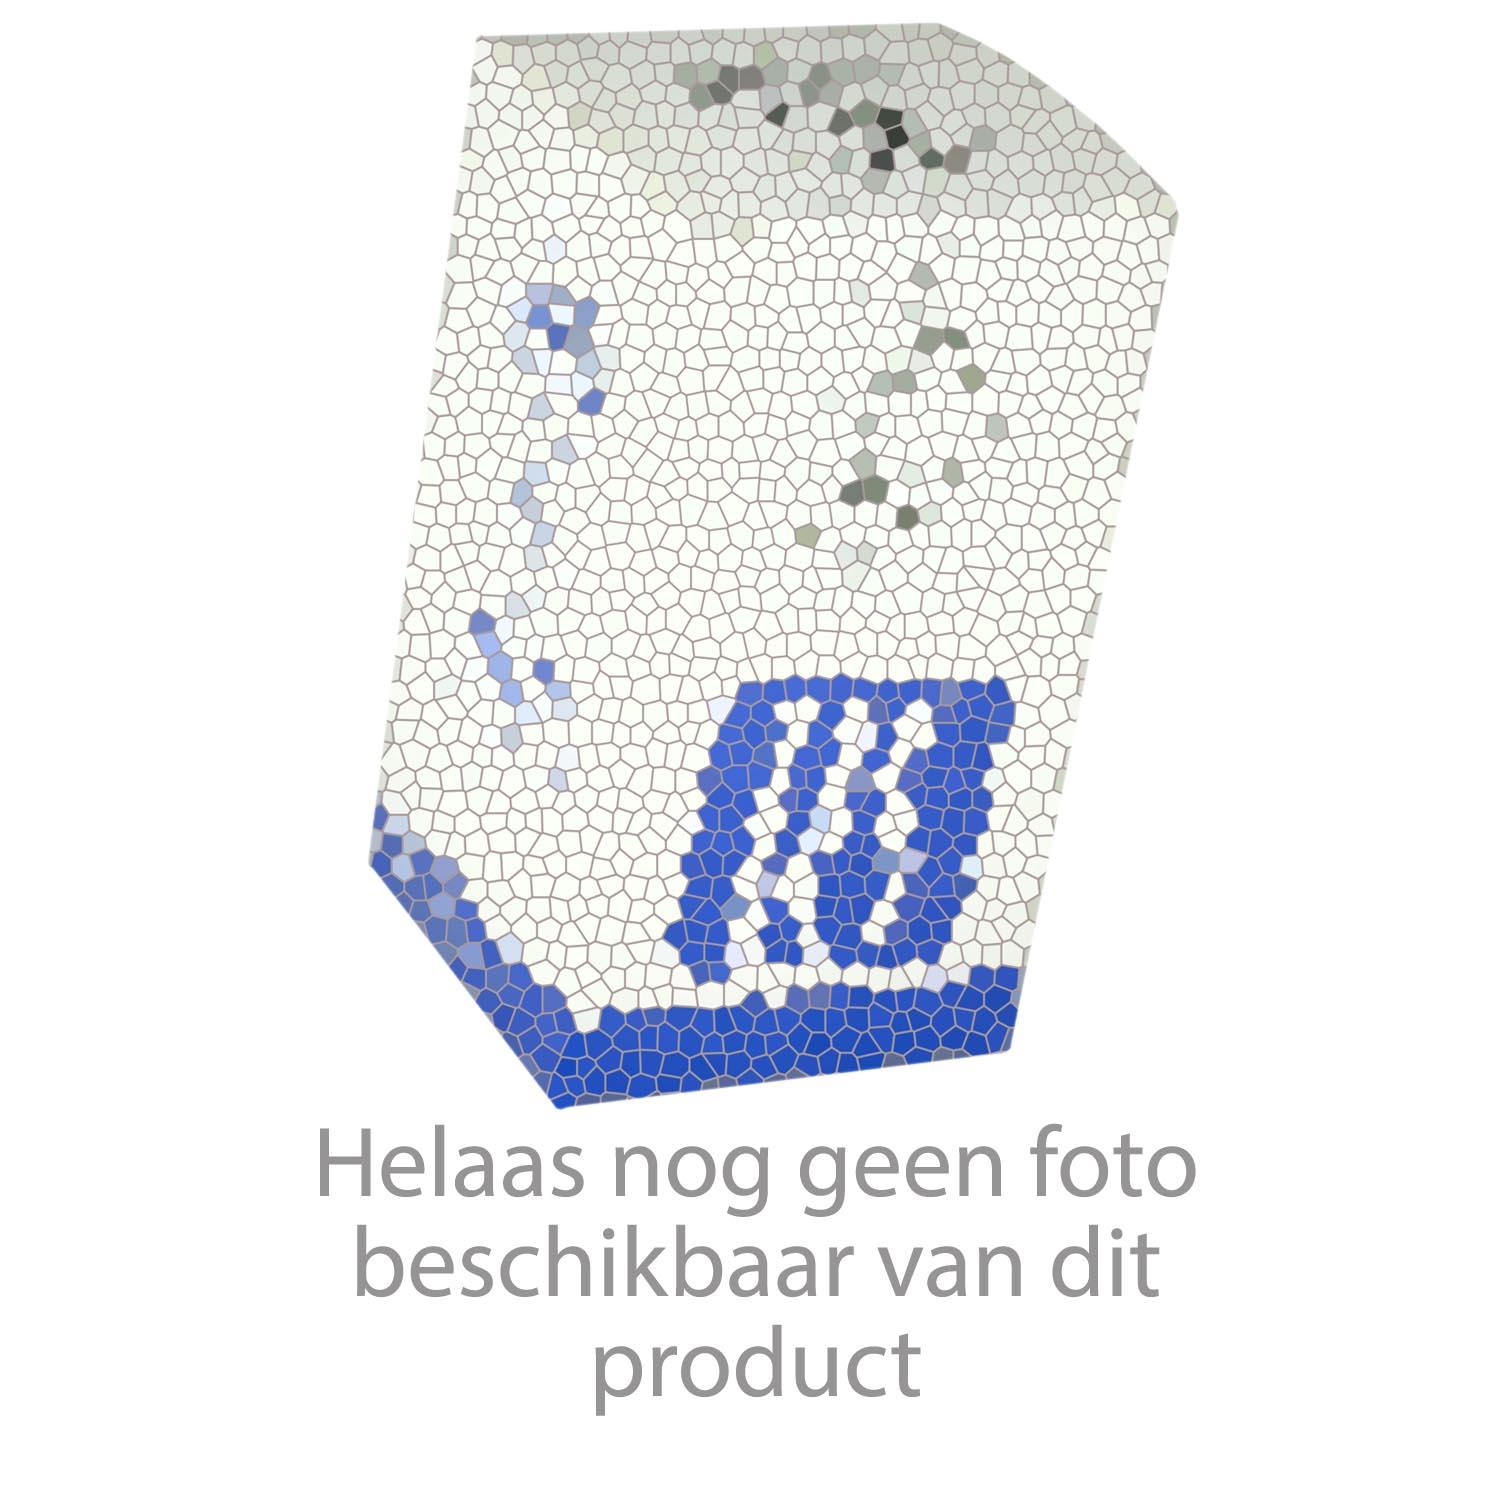 Grohe onderdelen Allure F-Digital Wastafelmengkraan Wand 36343000